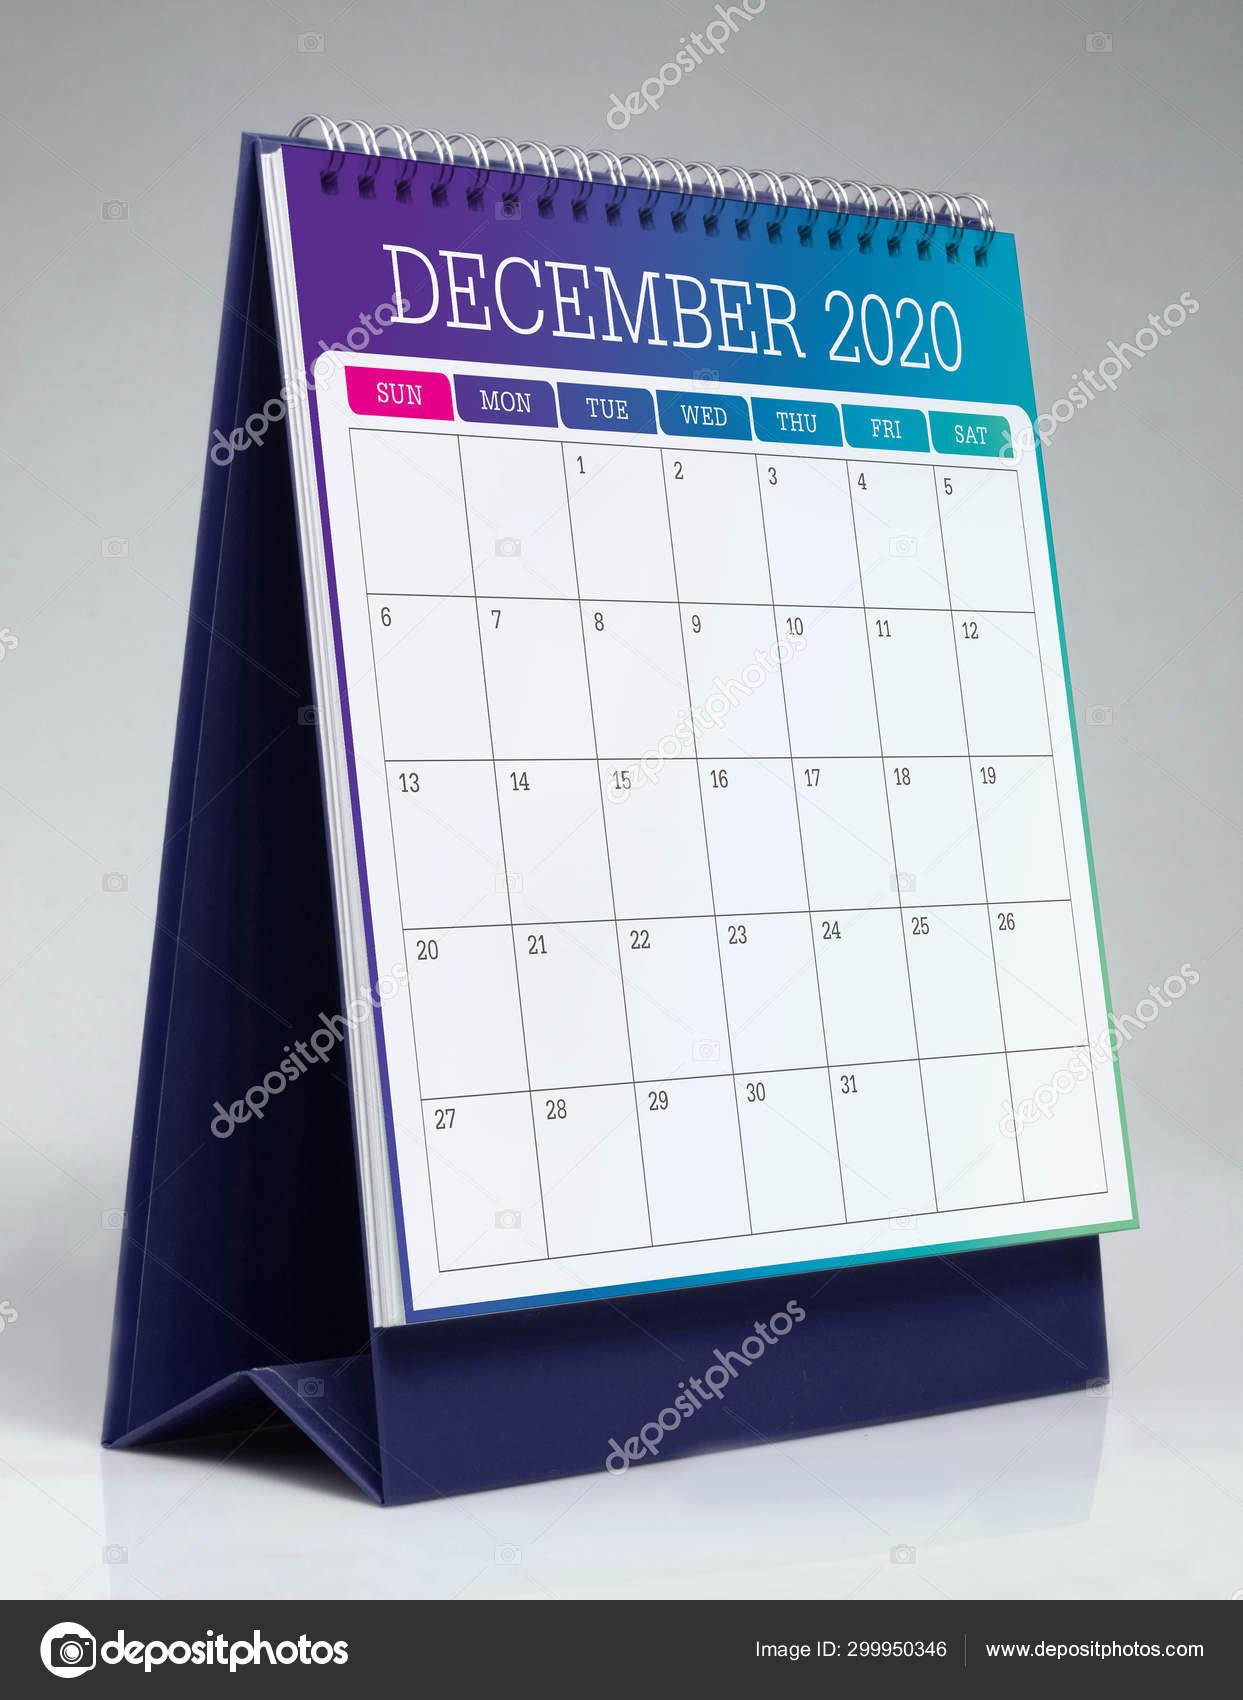 Dicembre Calendario 2020.Calendario Da Tavolo Semplice 2020 Dicembre Foto Stock